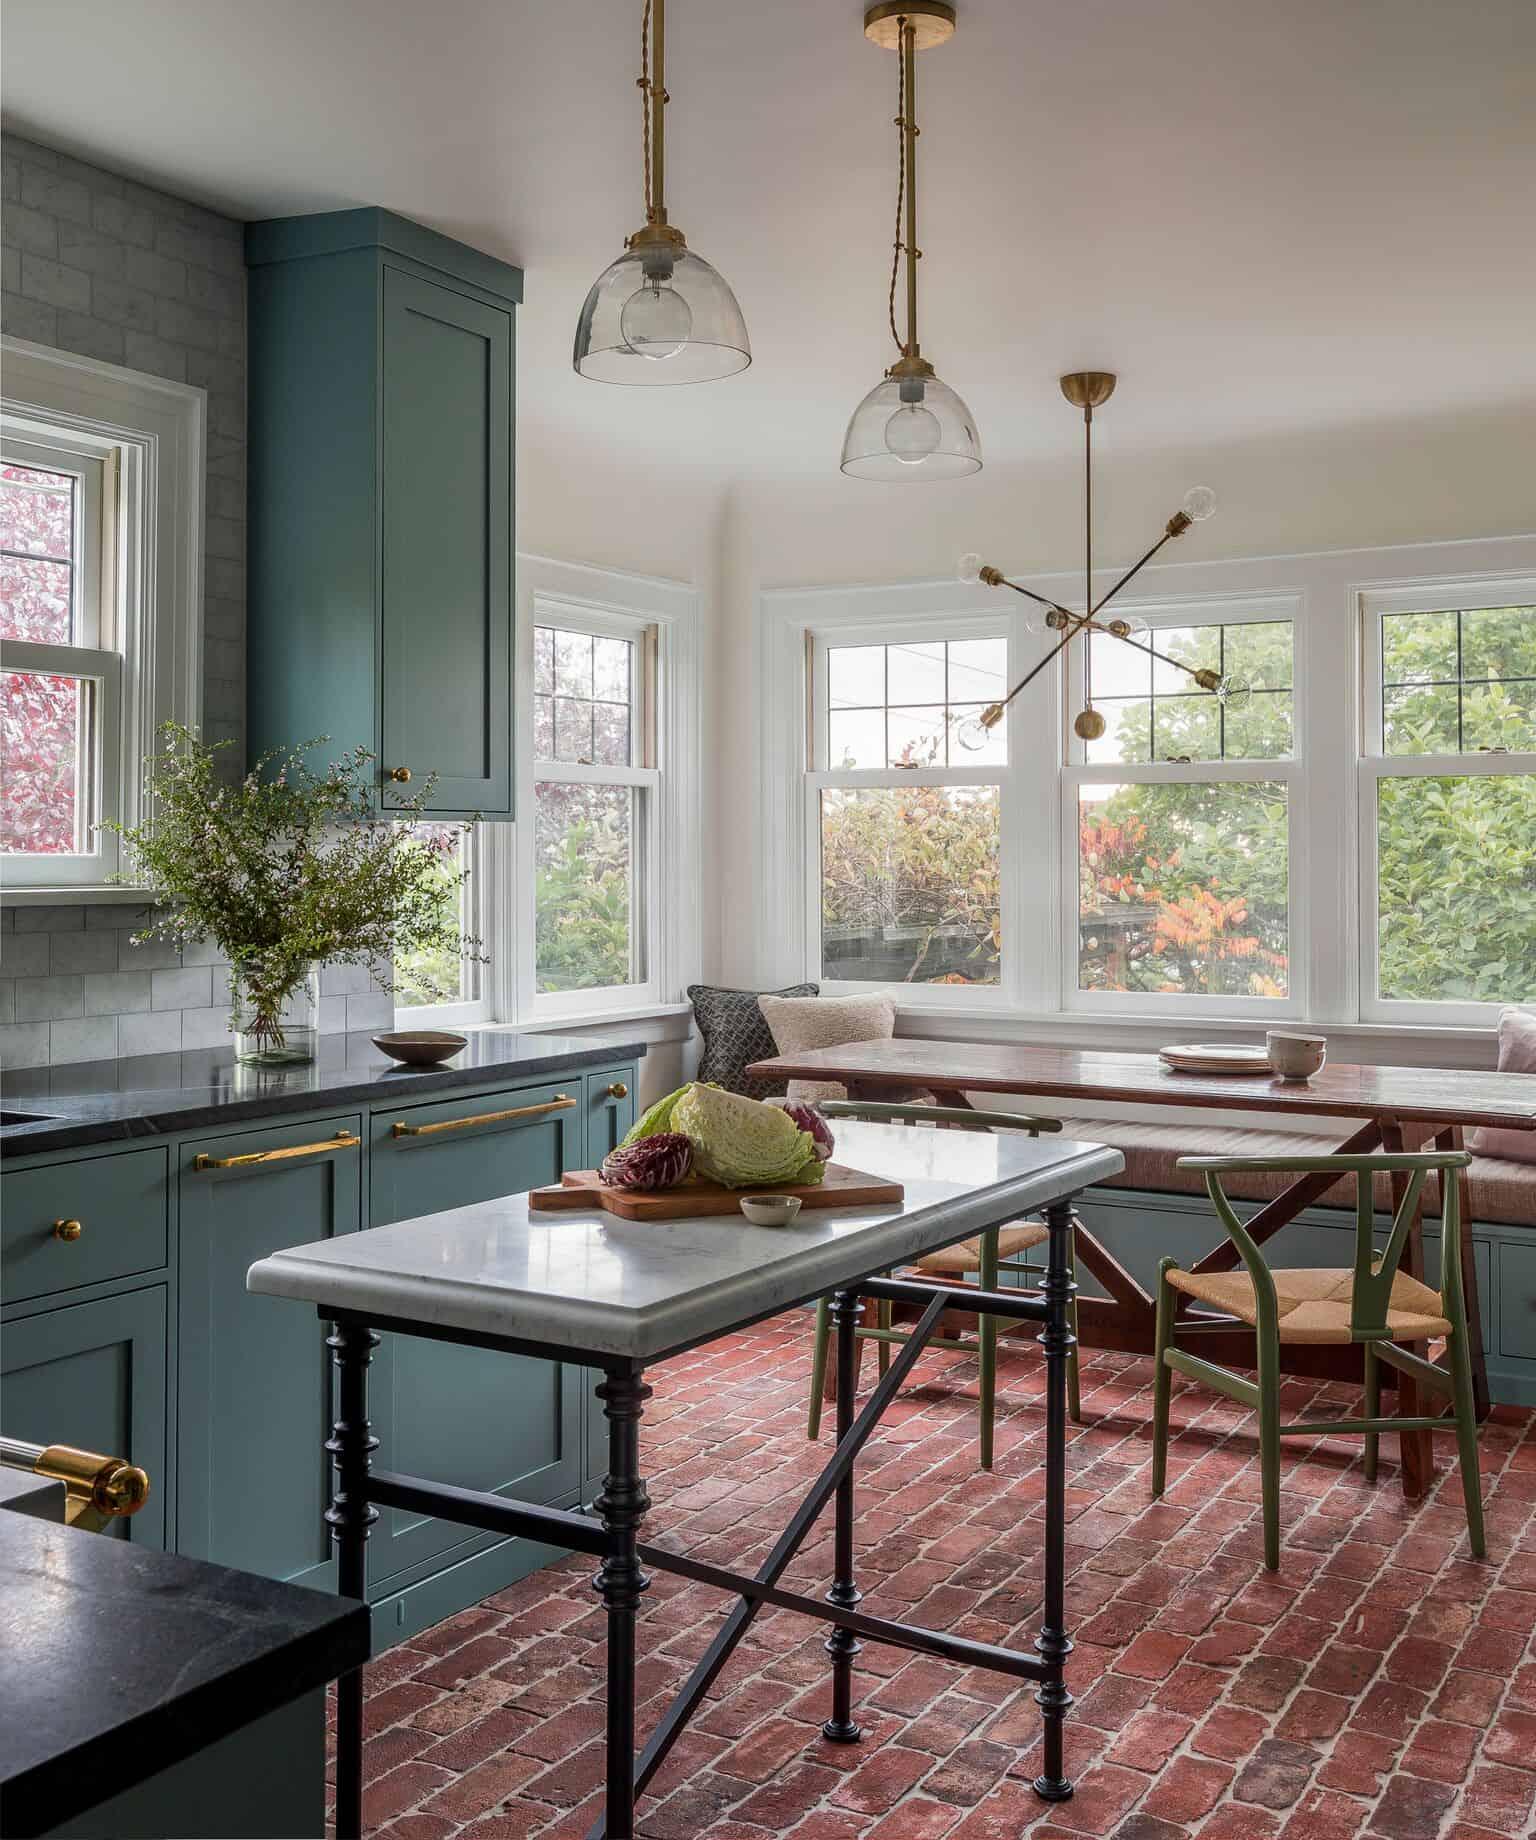 Heidi-Caillier-Design-Seattle-interior-designer-PNW-Tudor-kitchen